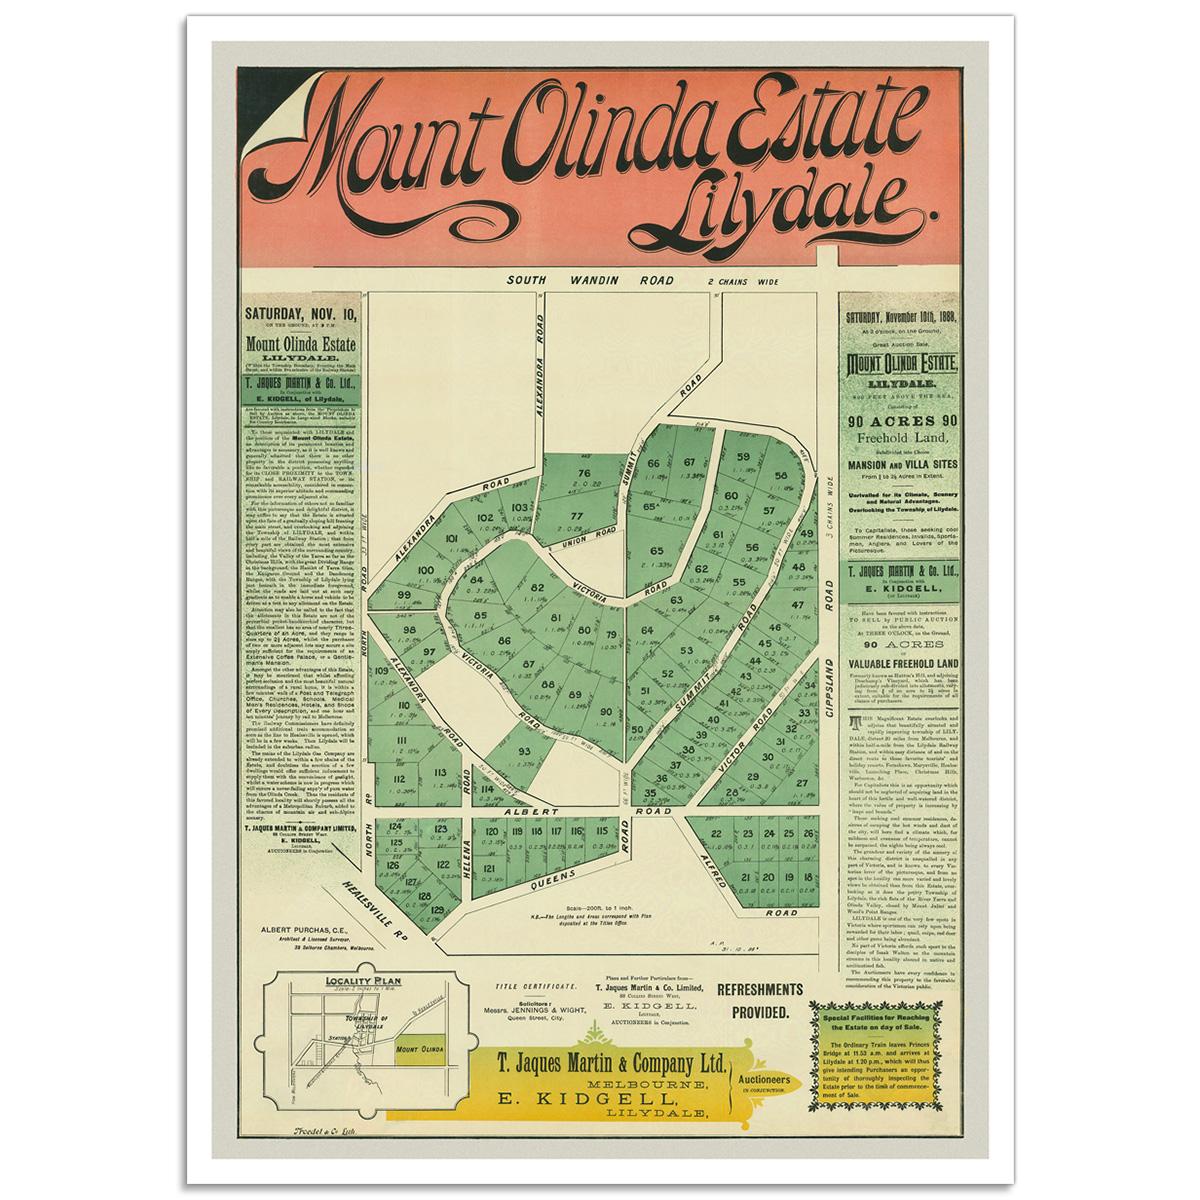 Mount Olinda Estate Lilydale - Vintage Australian Advertising Poster